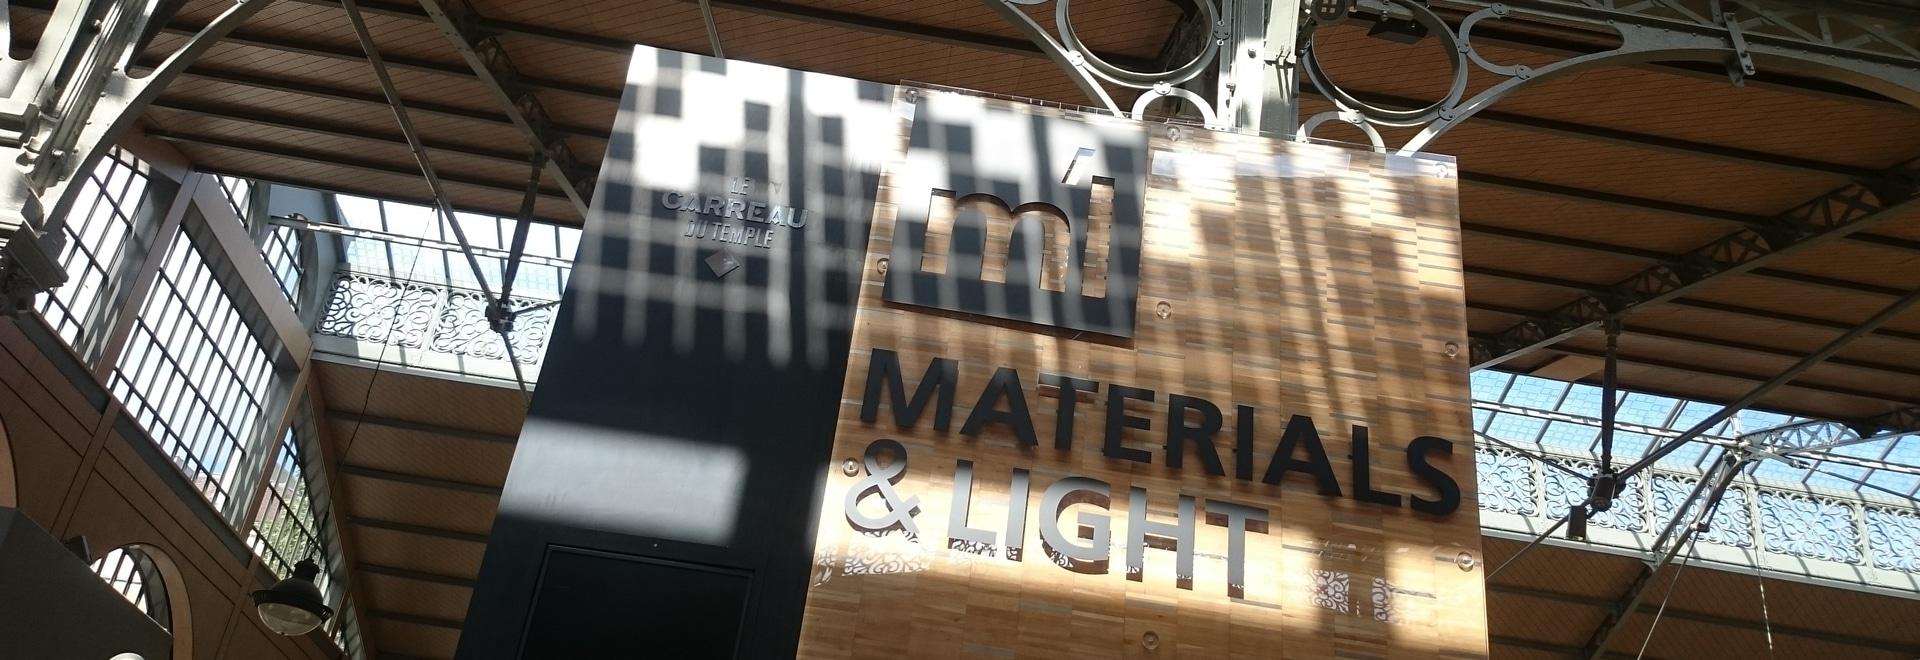 Aubrilam at the Materials & Light exhibition